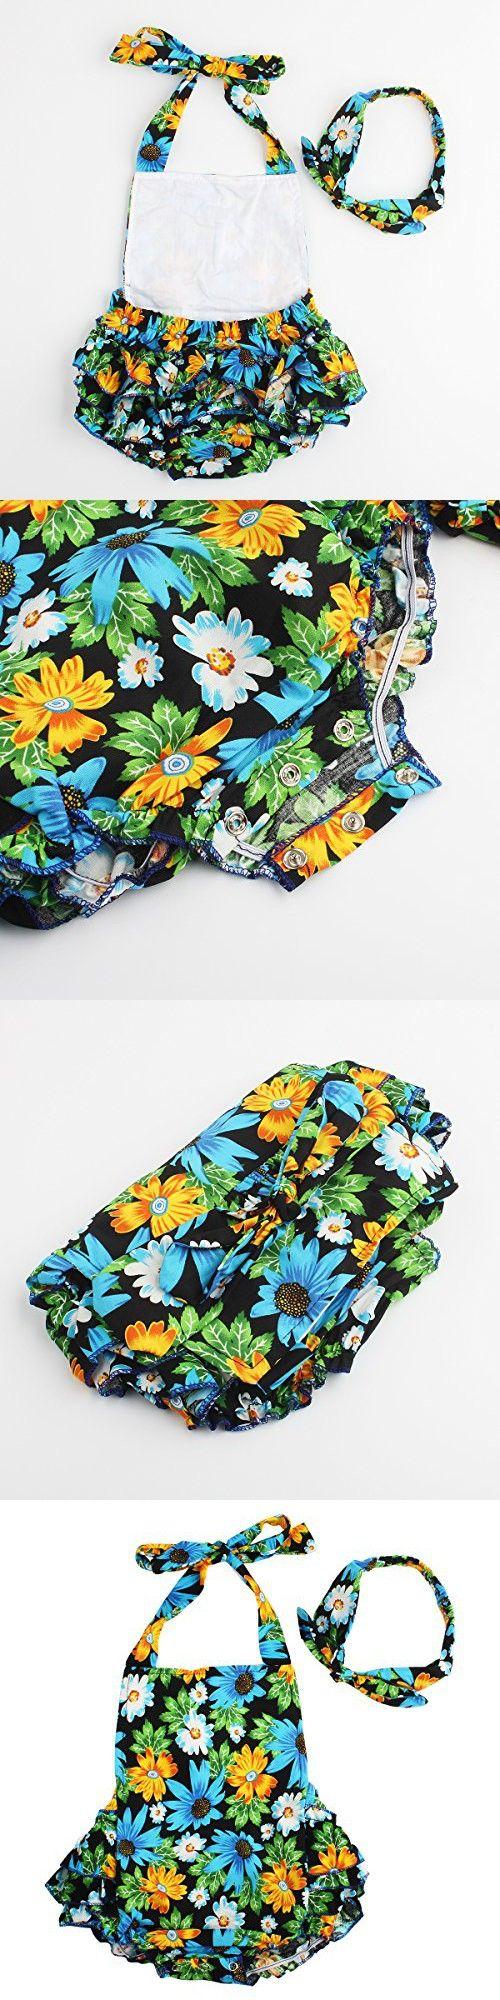 Baby Girls 2pcs Sets Cotton Ruffles Romper Outfits Clothes (L:24Months, Blue Chrysanthemum)